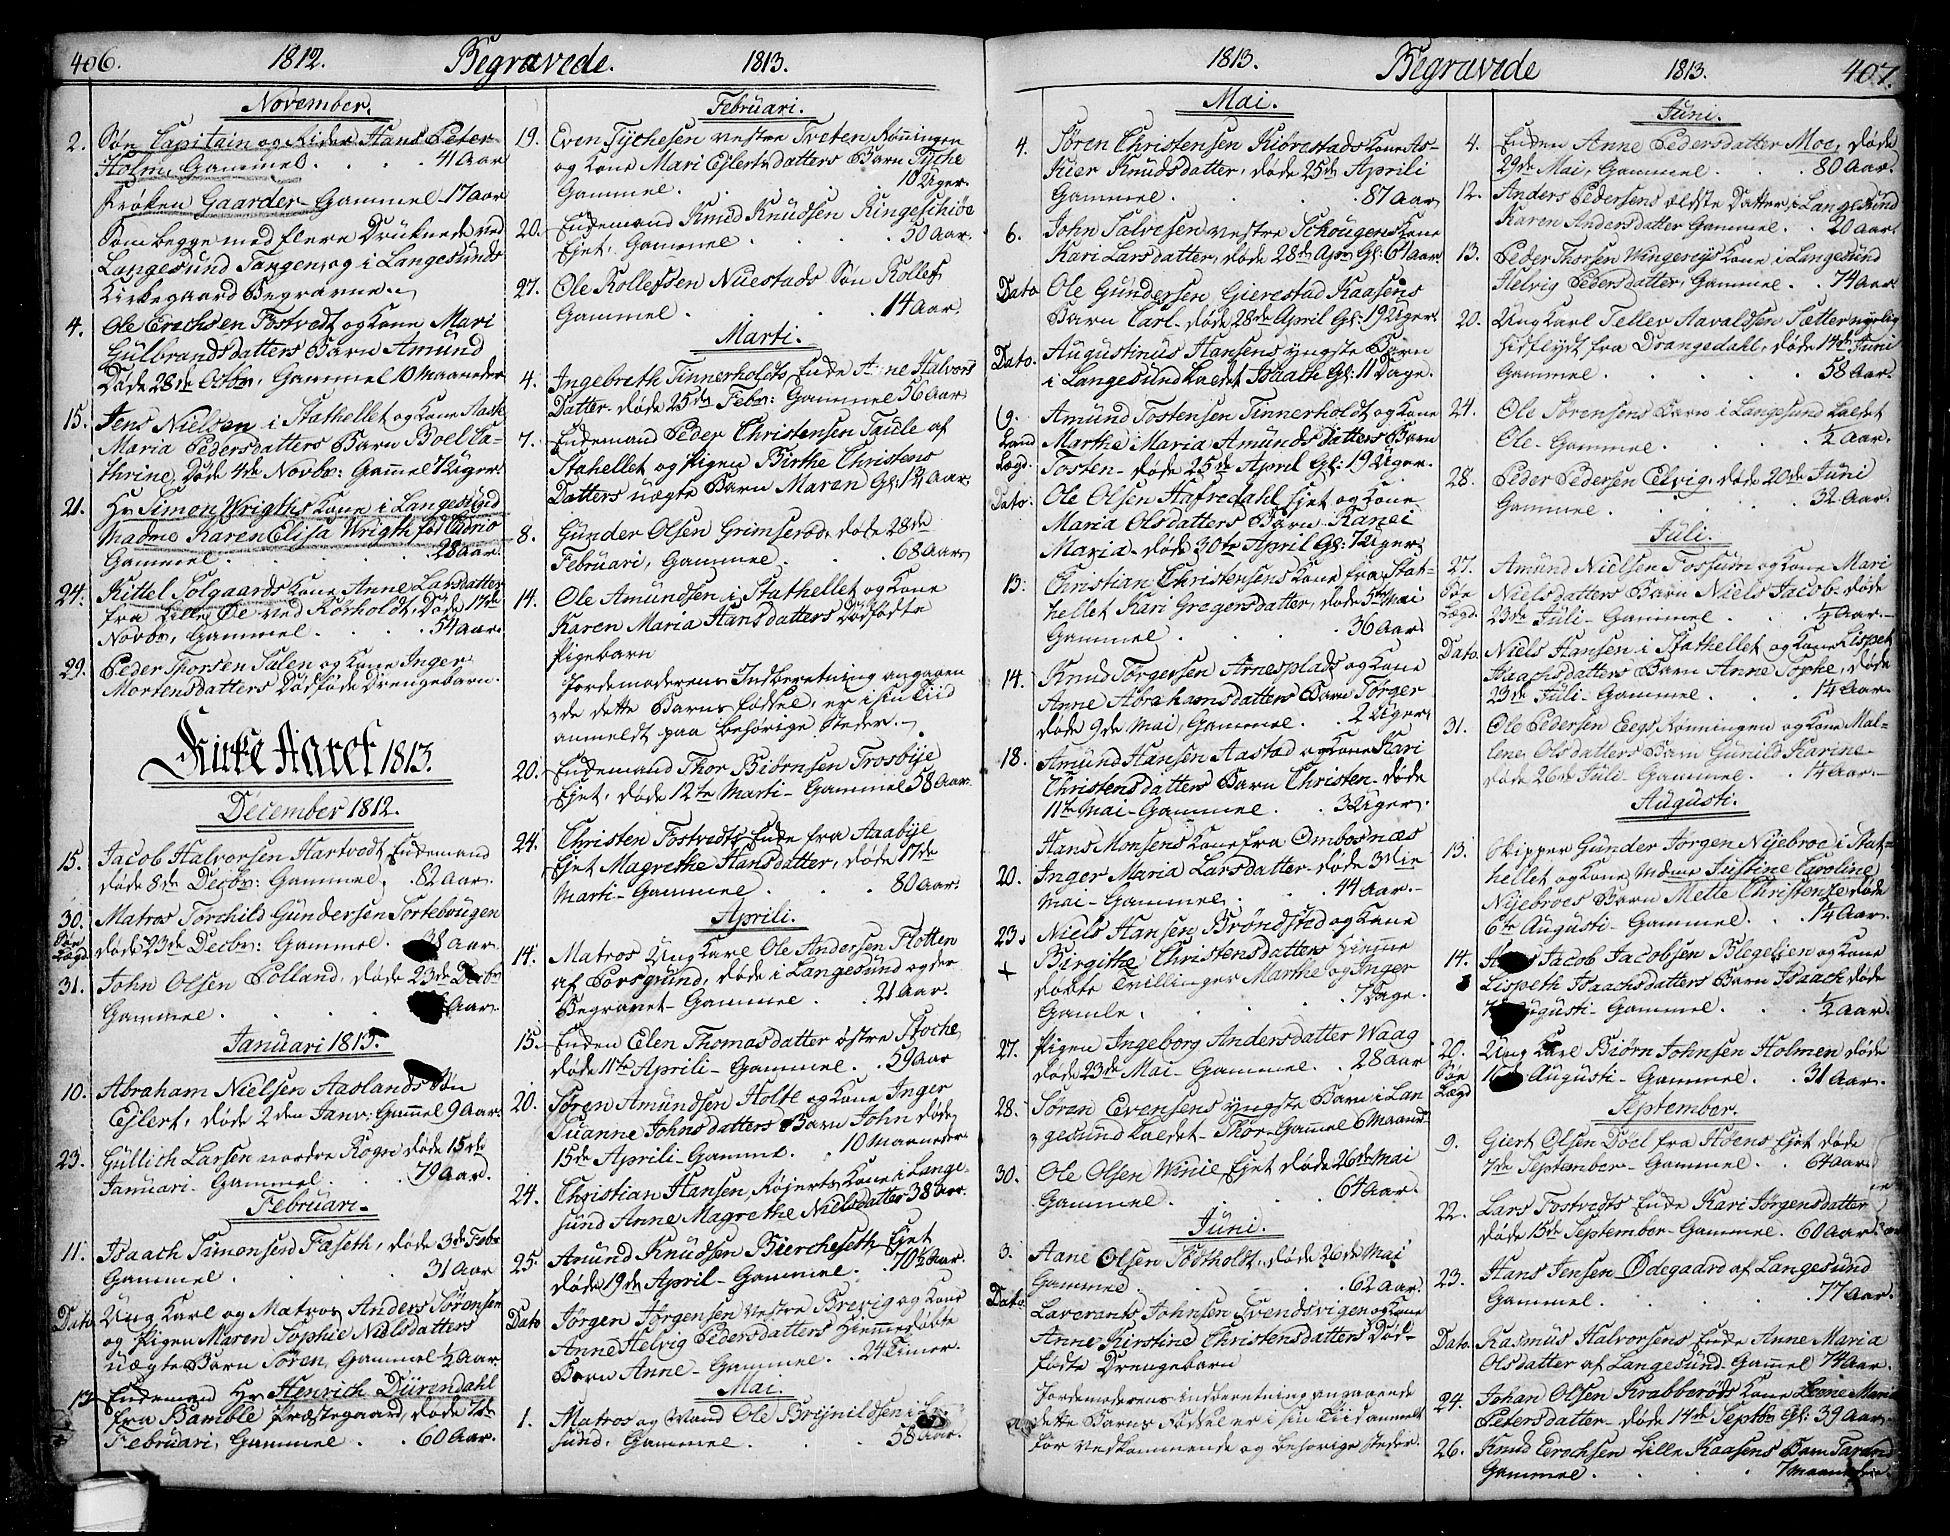 SAKO, Bamble kirkebøker, F/Fa/L0002: Ministerialbok nr. I 2, 1775-1814, s. 406-407